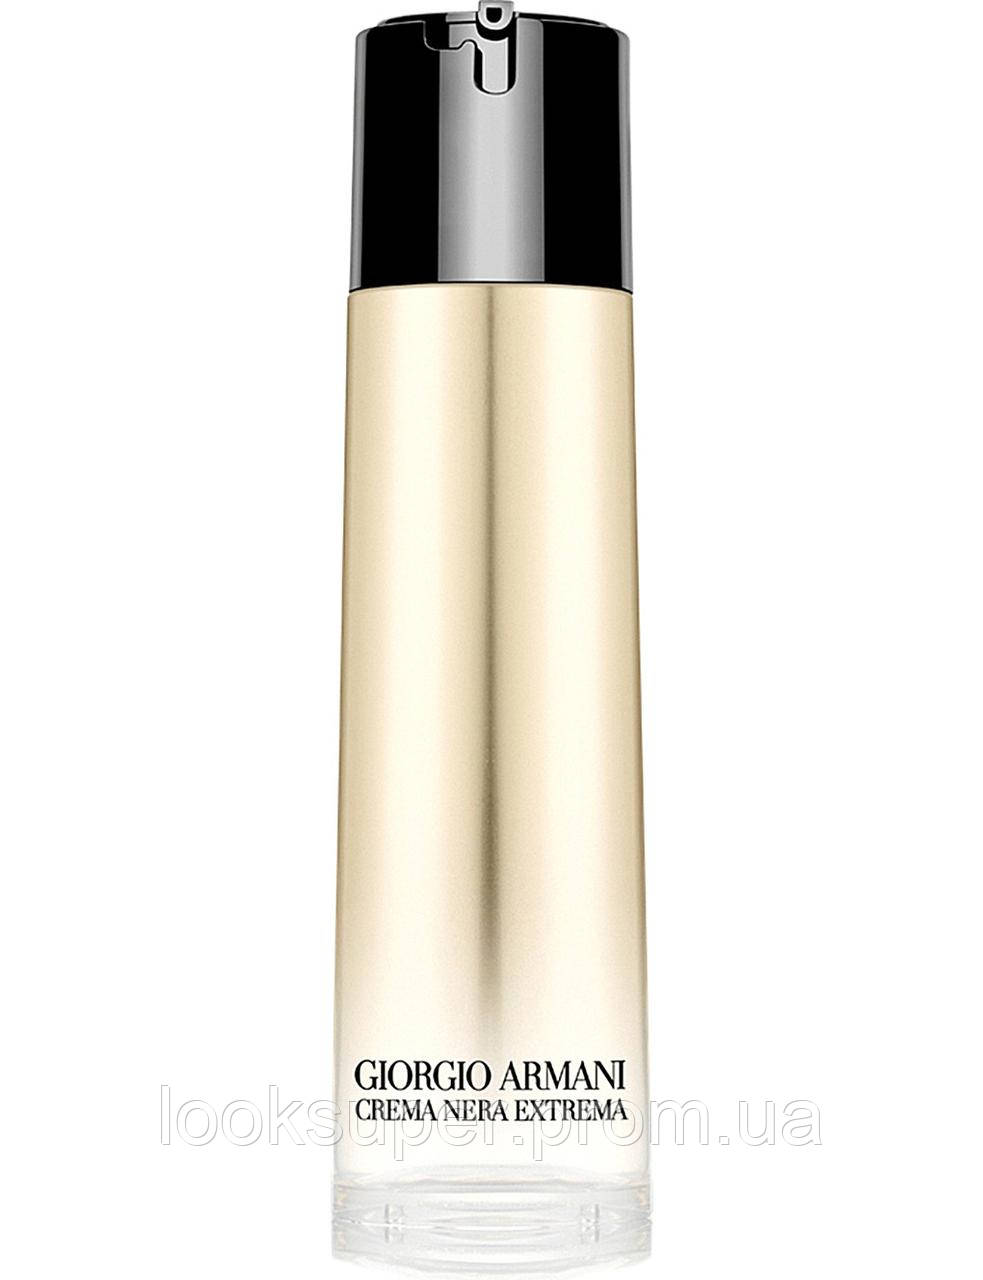 Лосьон GIORGIO ARMANI Acqua Pantelleria hydrating lotion 150ml